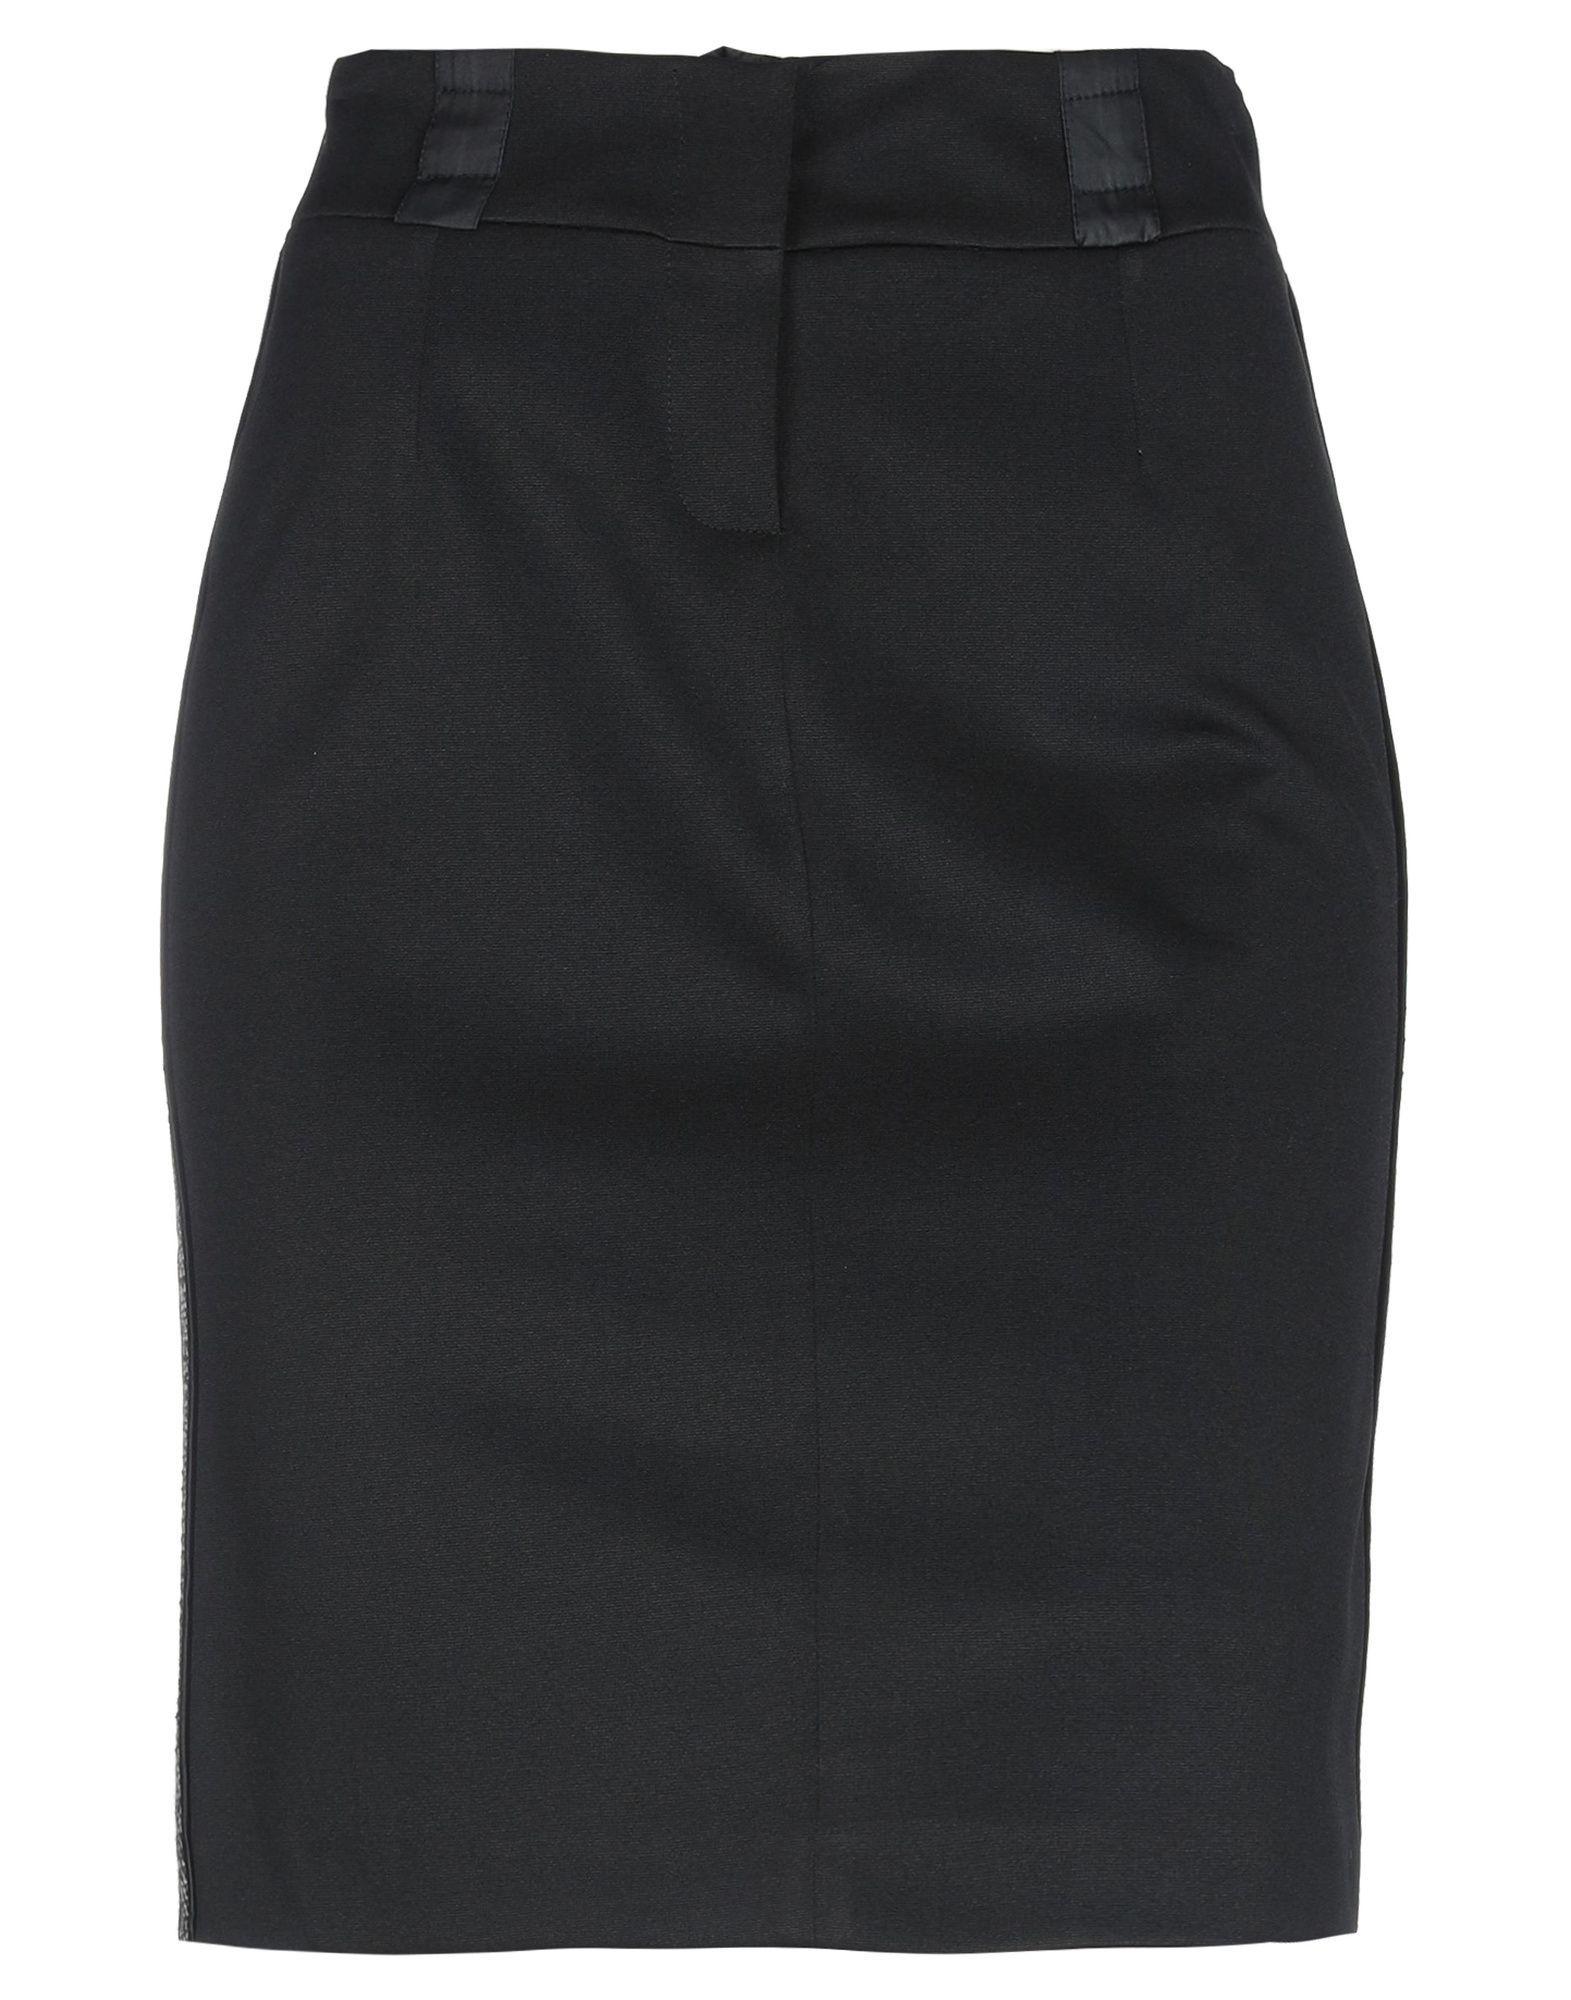 Pianurastudio Black Pencil Skirt